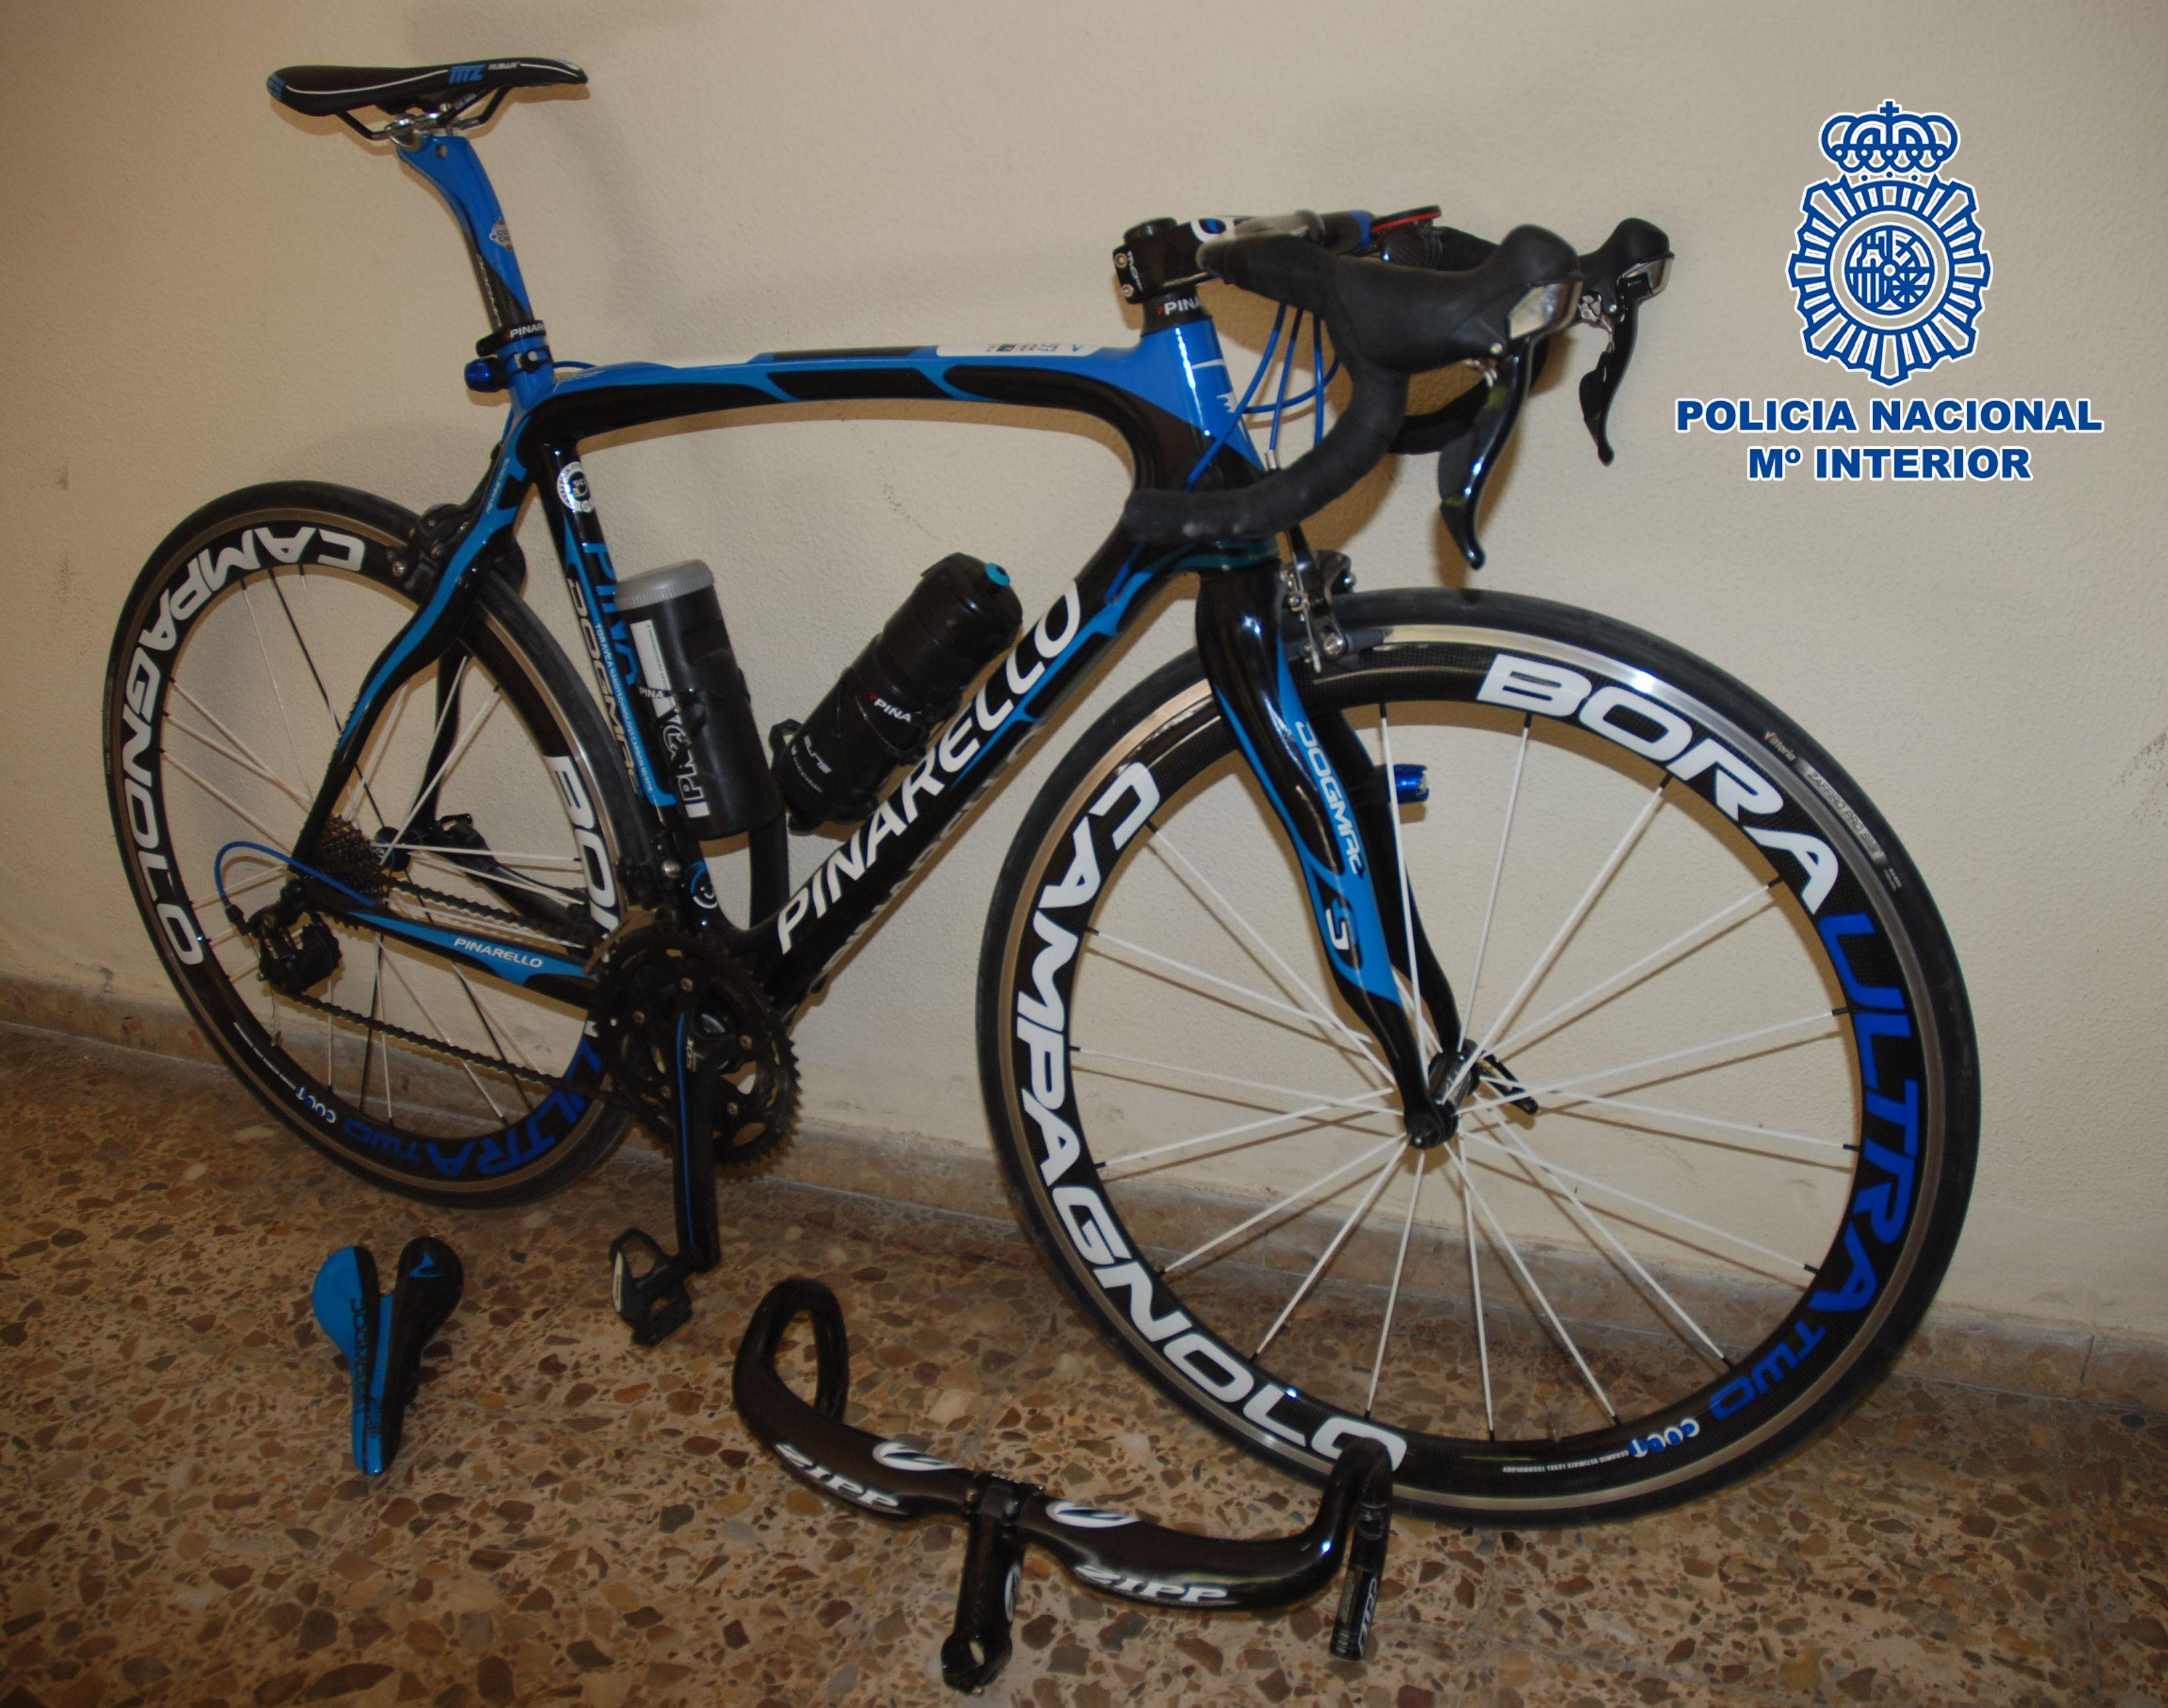 bicicleta falsificada 2